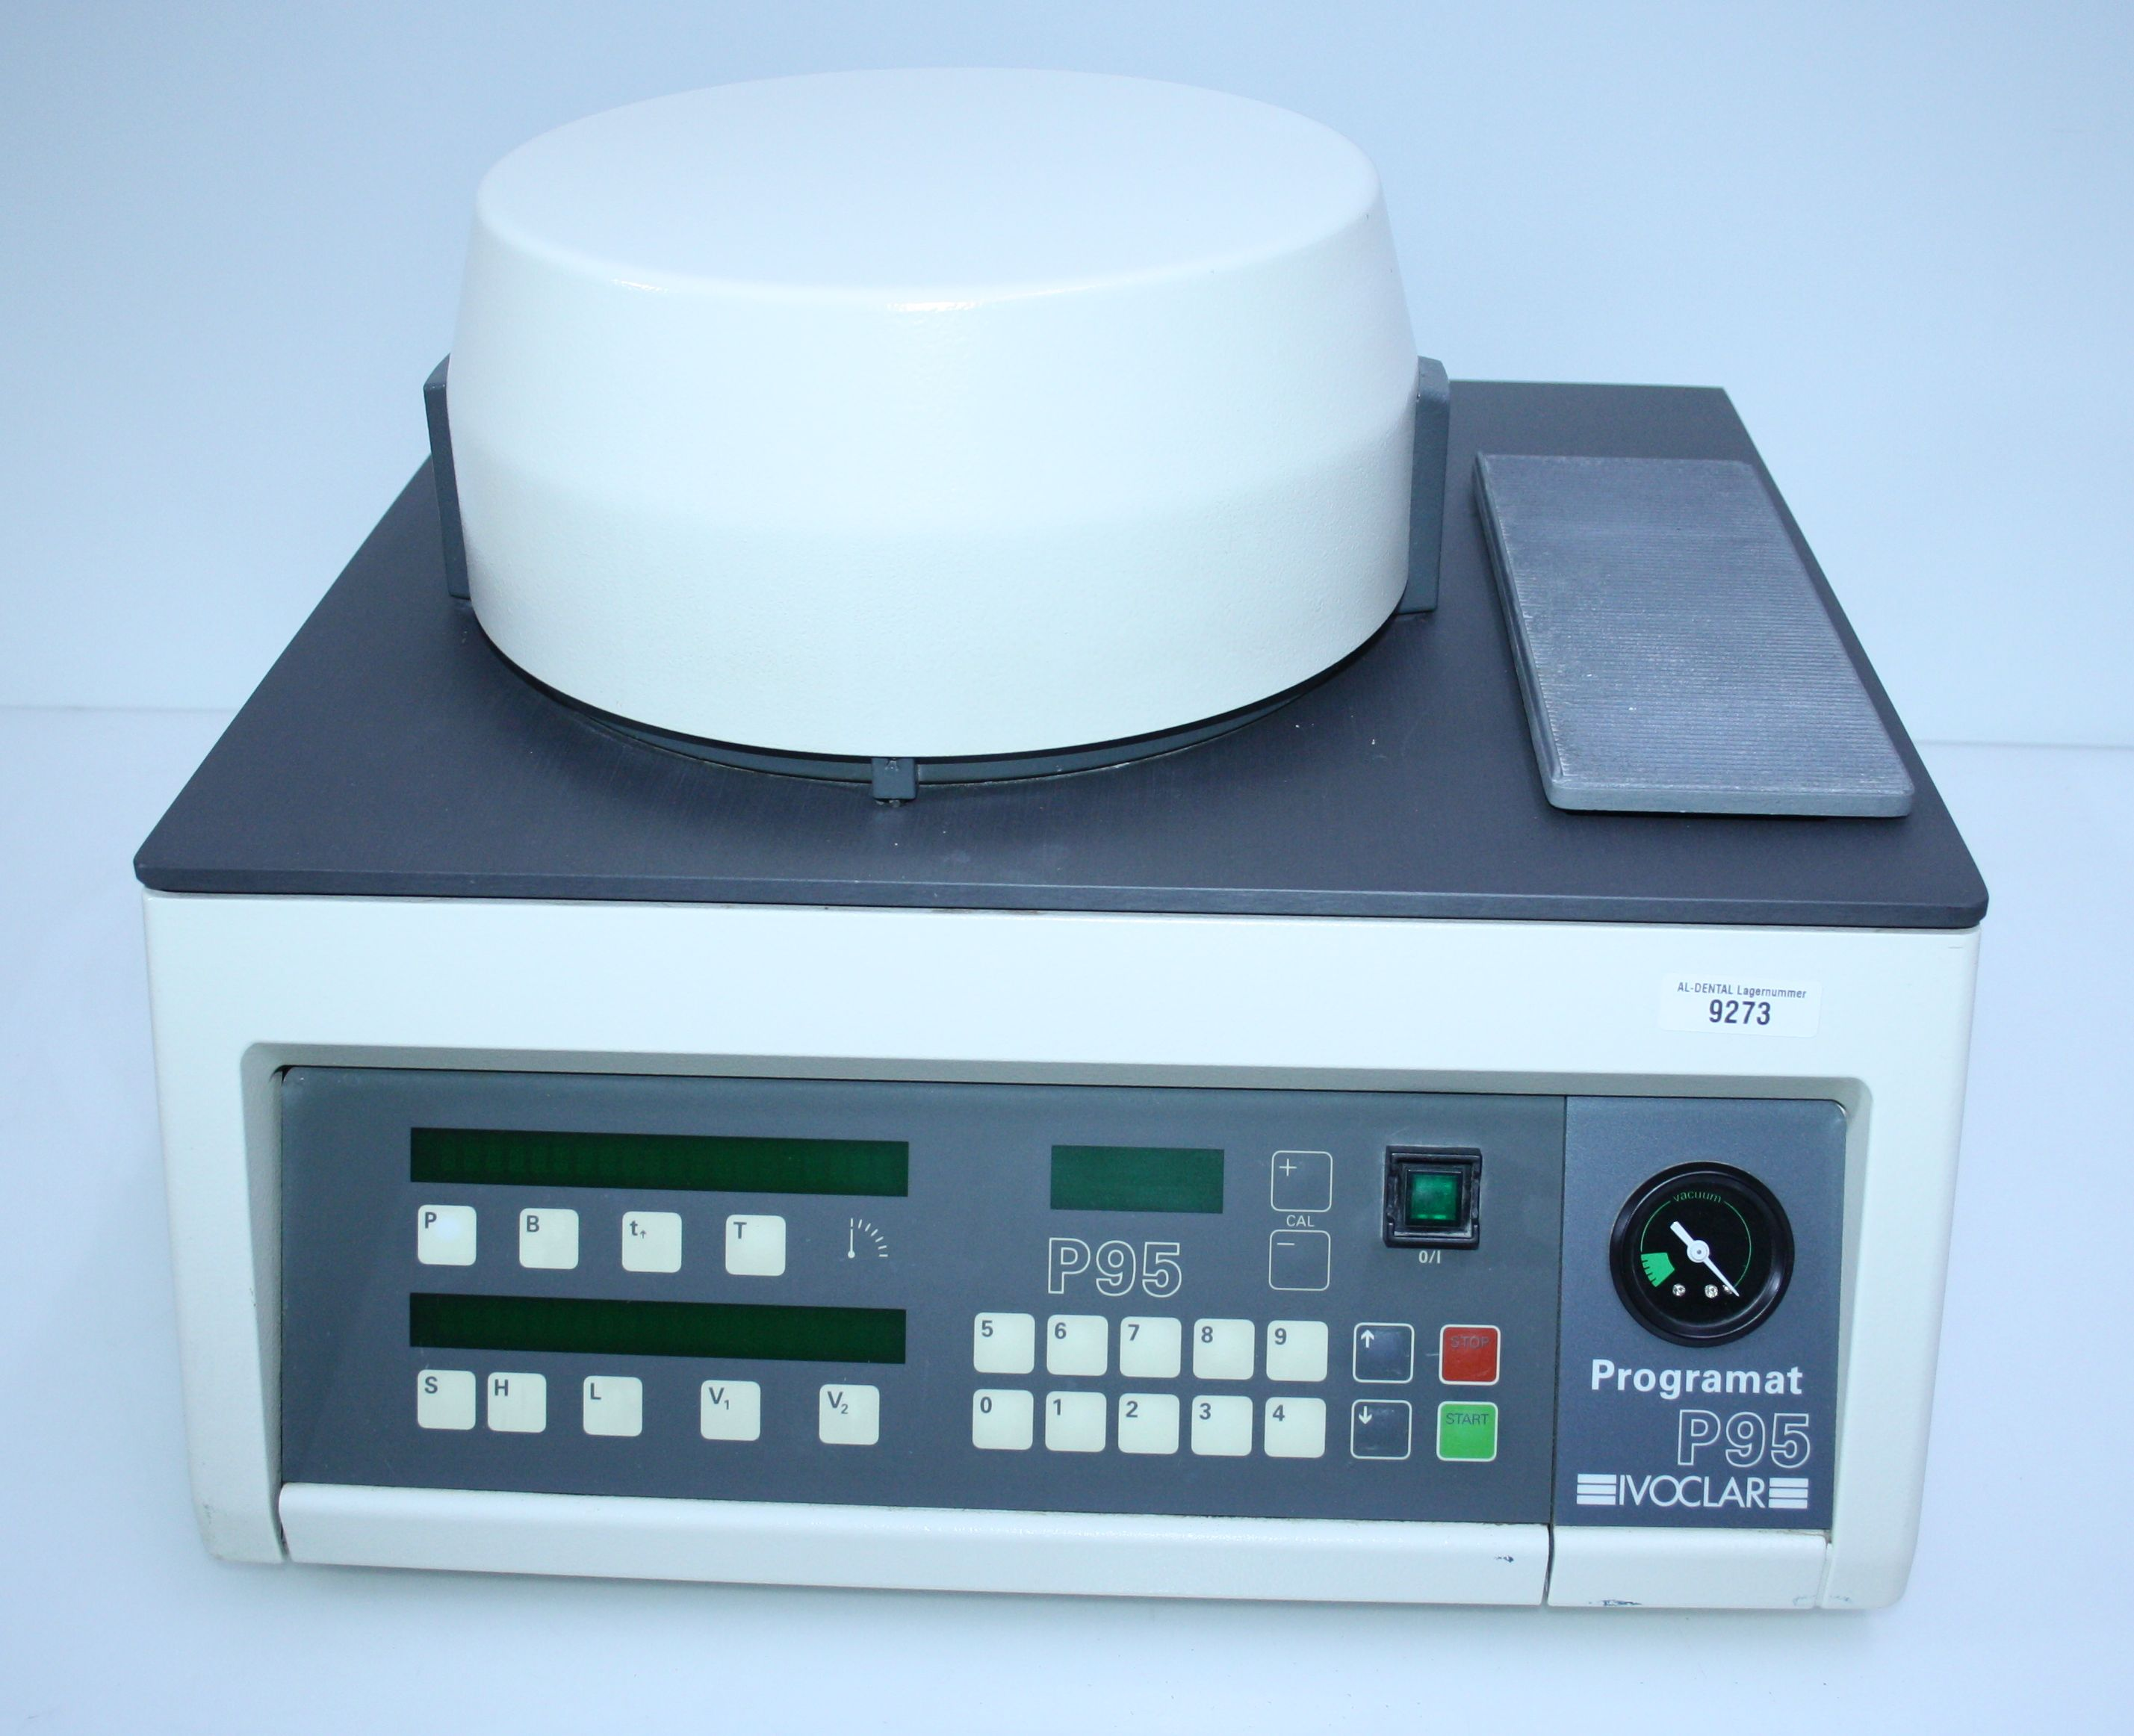 IVOCLAR Keramikofen Typ Programat P 95 # 9273